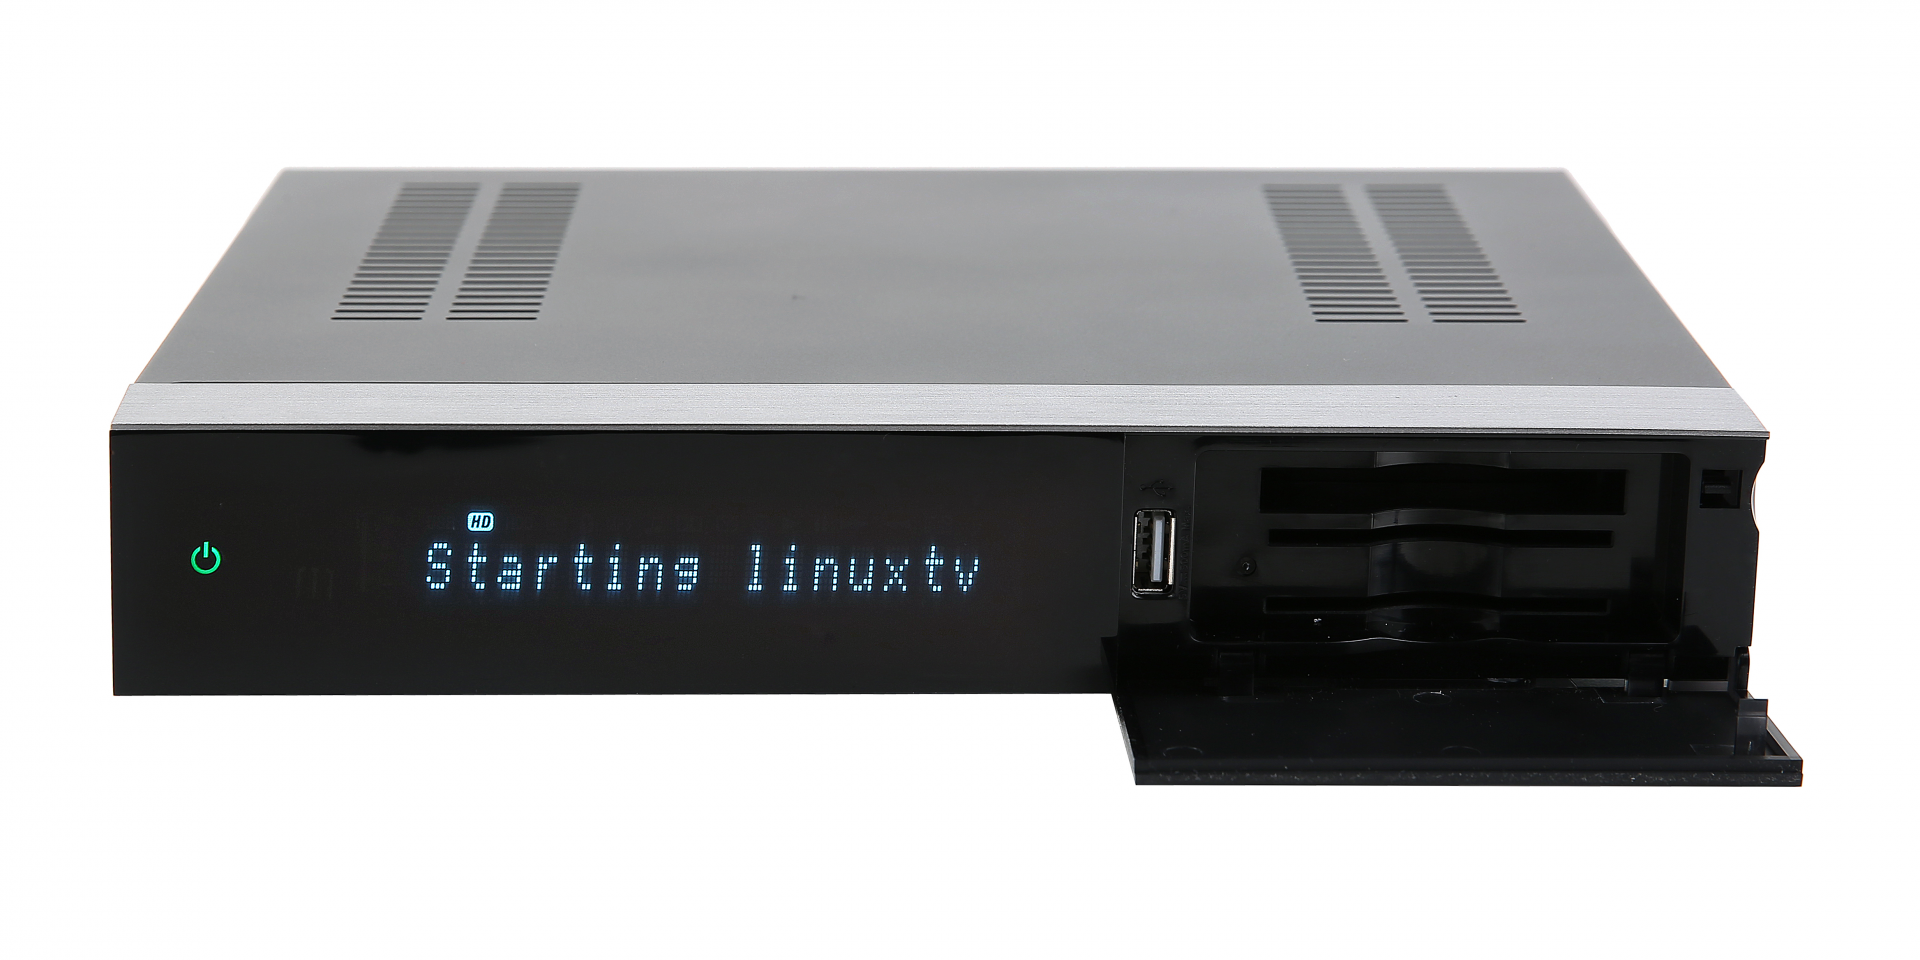 SAB Alpha Triple HD E2 Linux Kabel cable Receiver 1.3 GHz Dual Core OpenPLI